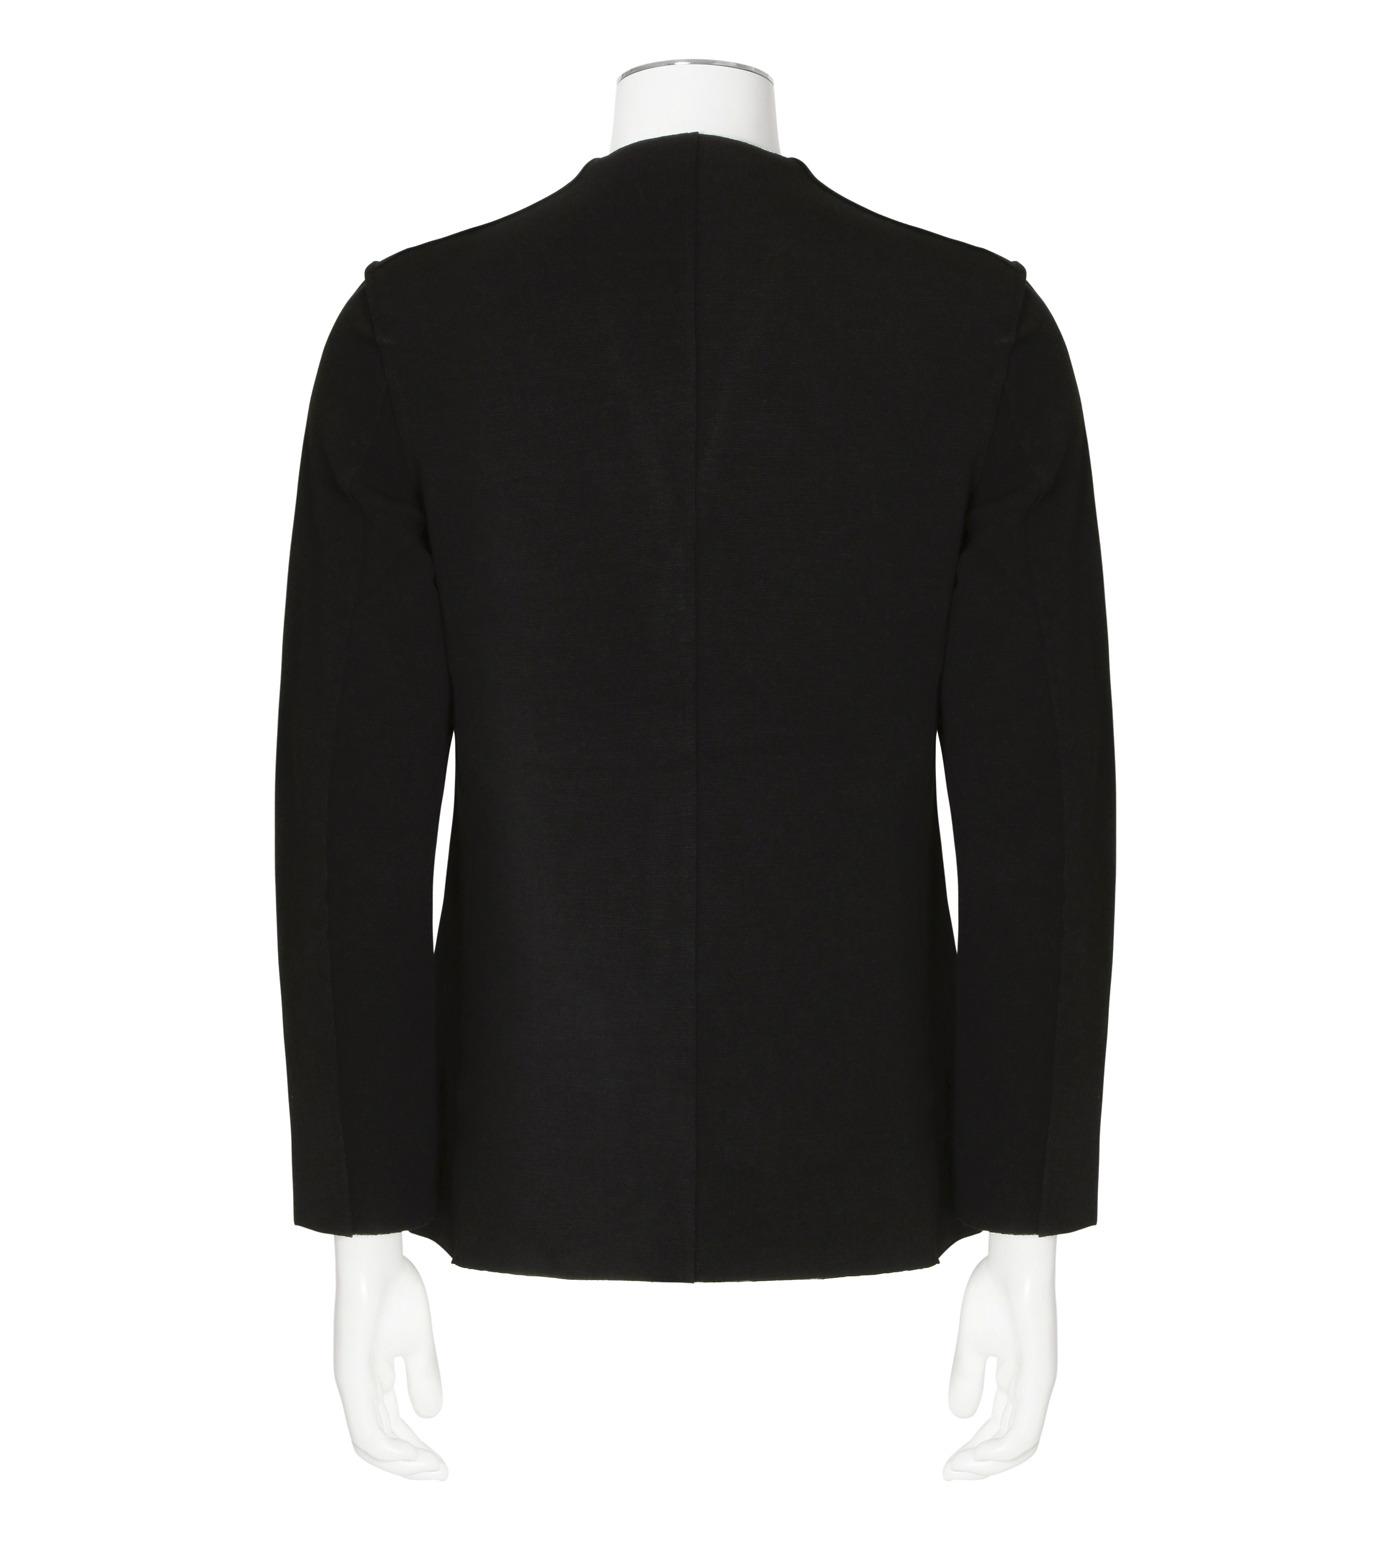 RAINMAKER(レインメーカー)のrib nocollar jacket-BLACK(ジャケット/jacket)-RM162-006-13 拡大詳細画像2